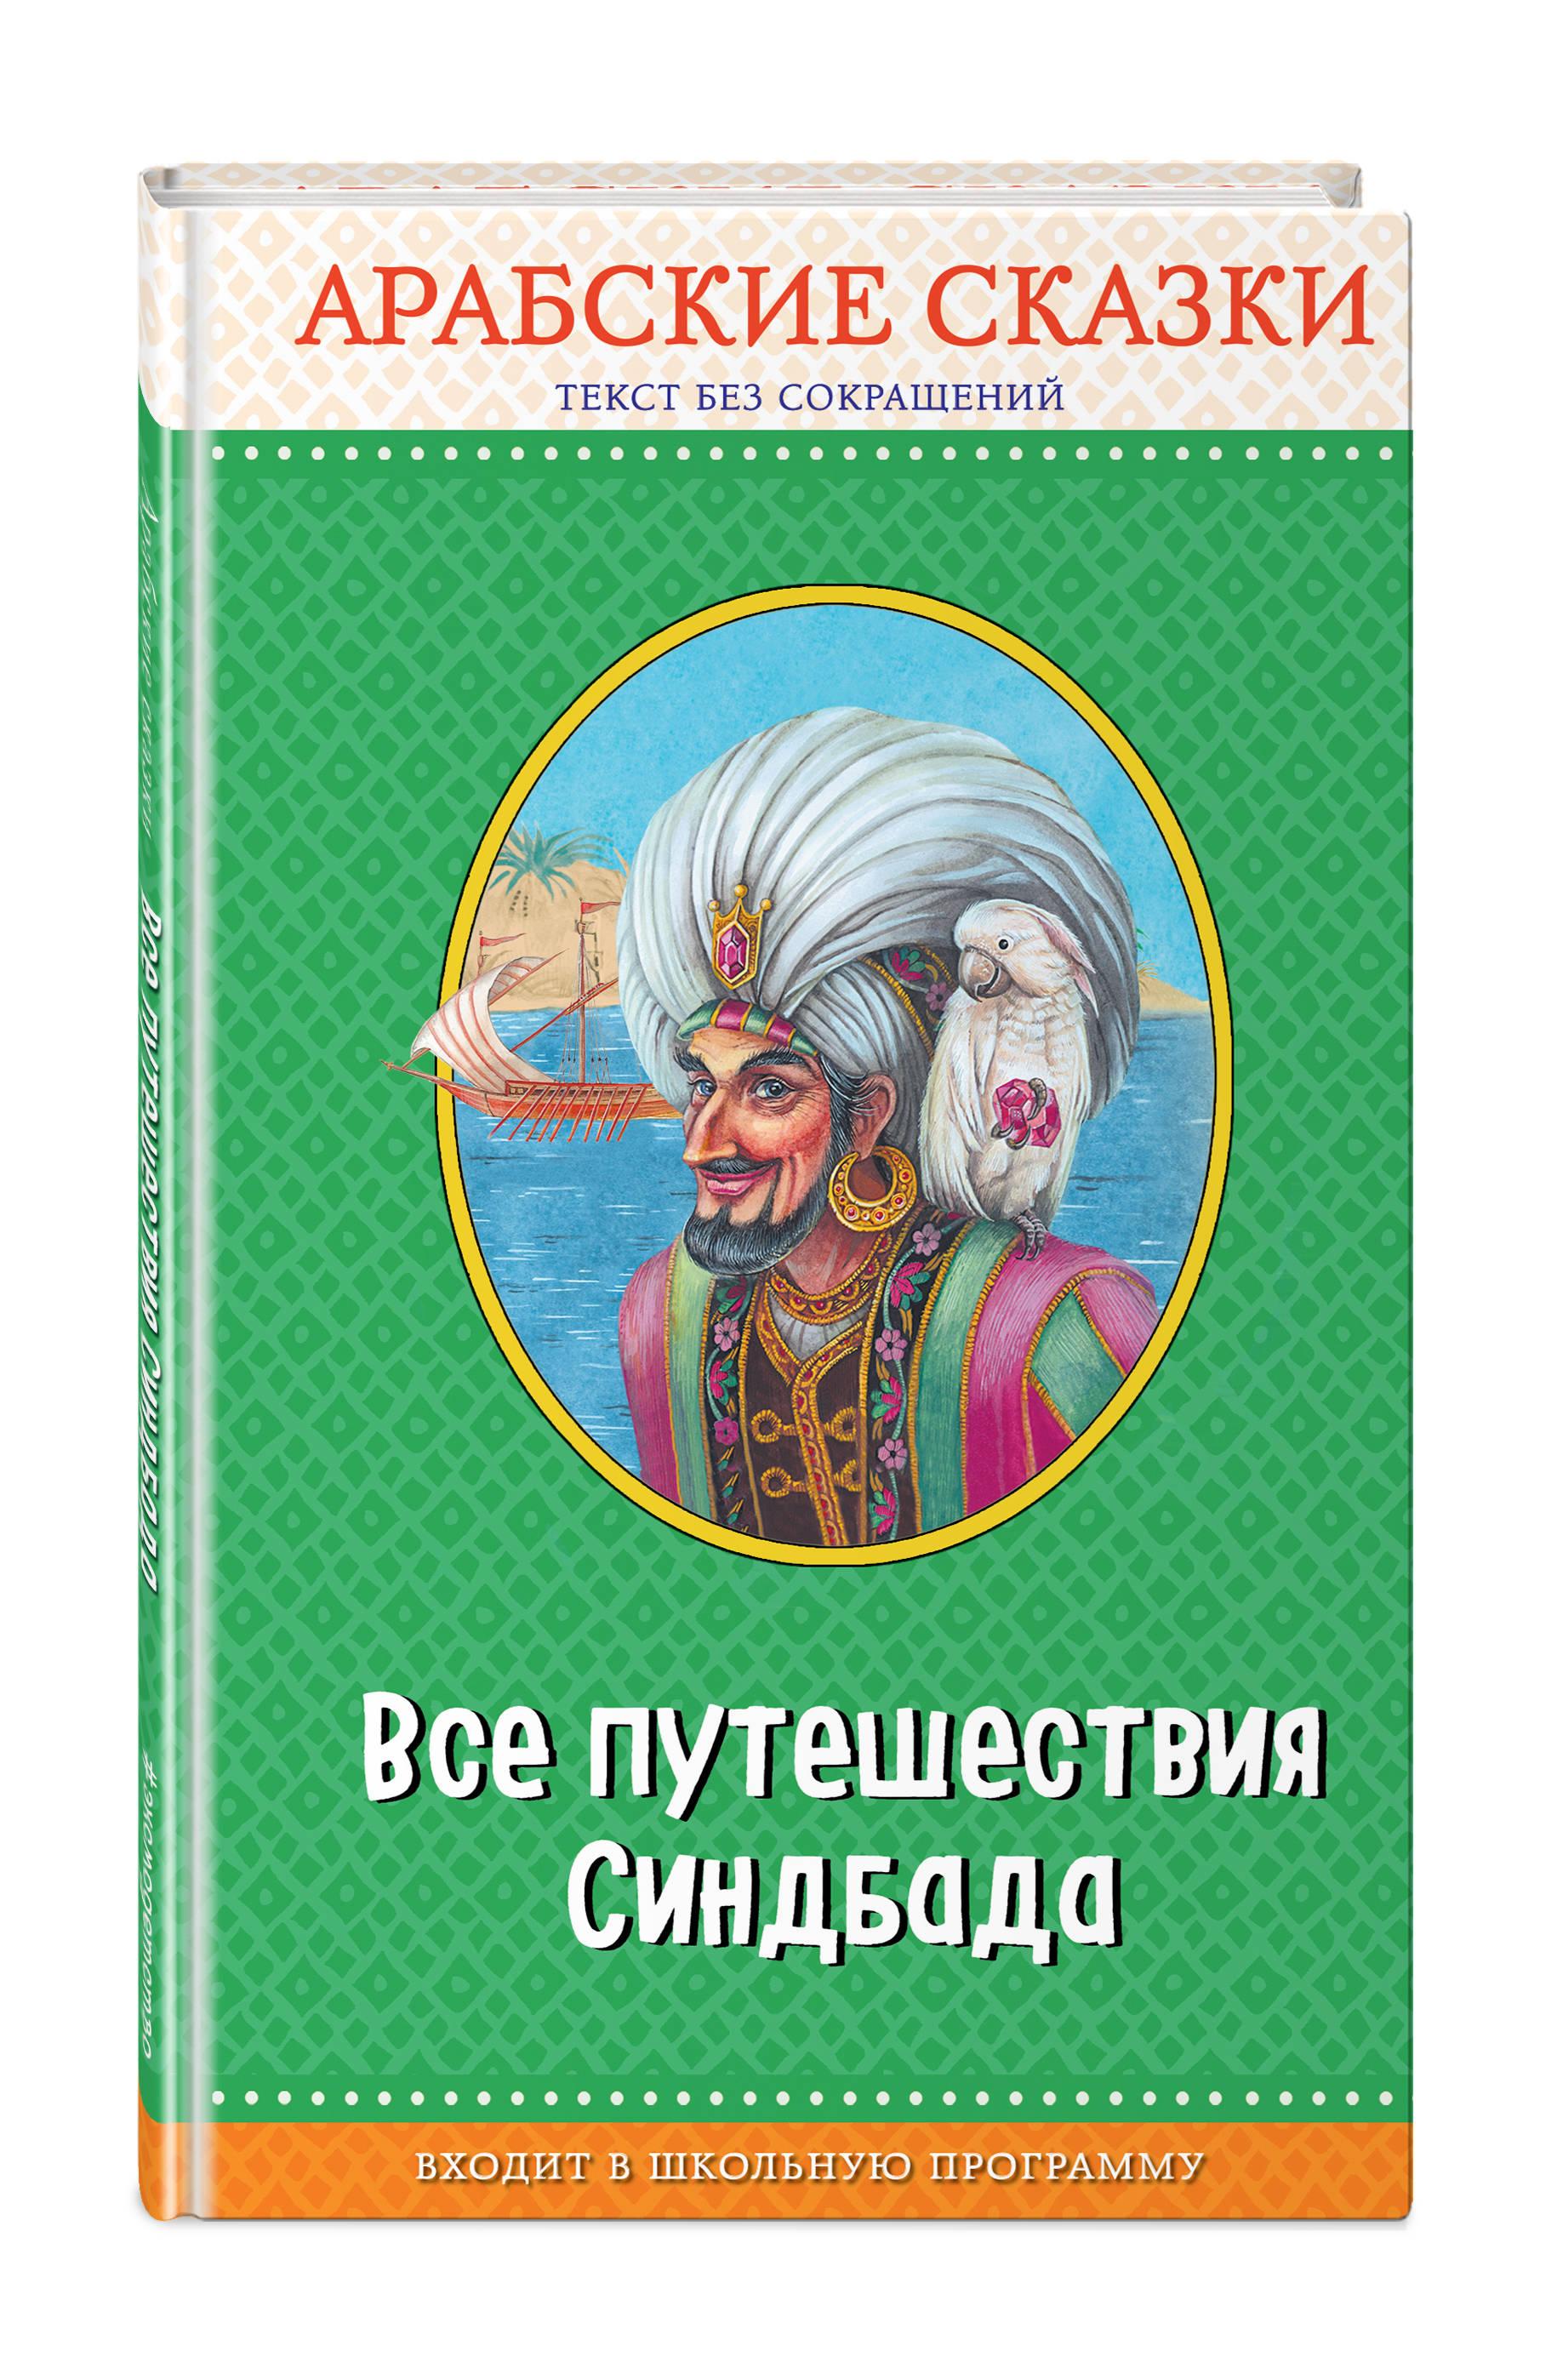 Все путешествия Синдбада. Арабские сказки махаон книга арабские сказки аладдин и волшебная лампа